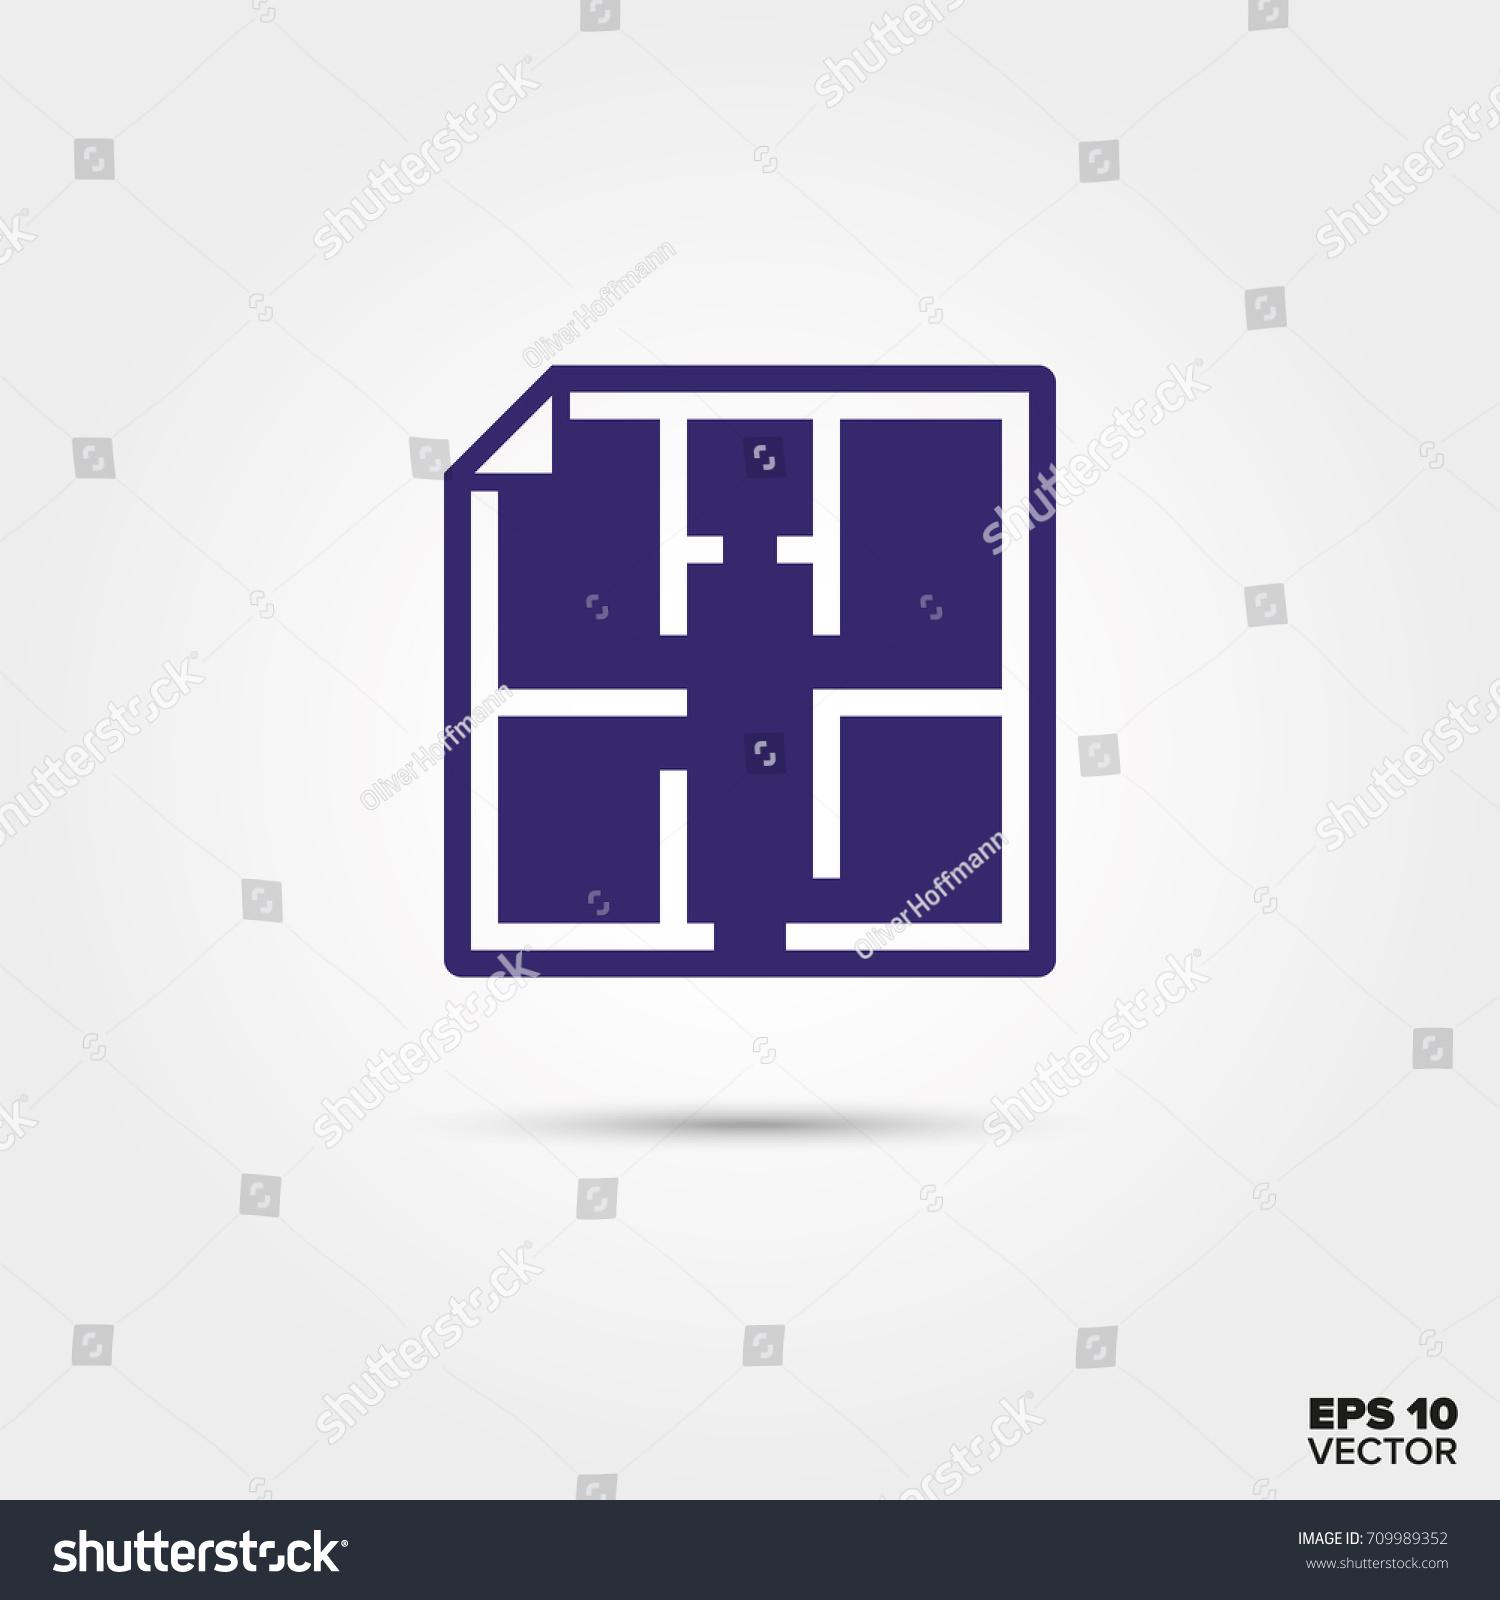 Blueprint building floor plan vector icon stock vector 709989352 blueprint of building floor plan vector icon malvernweather Images